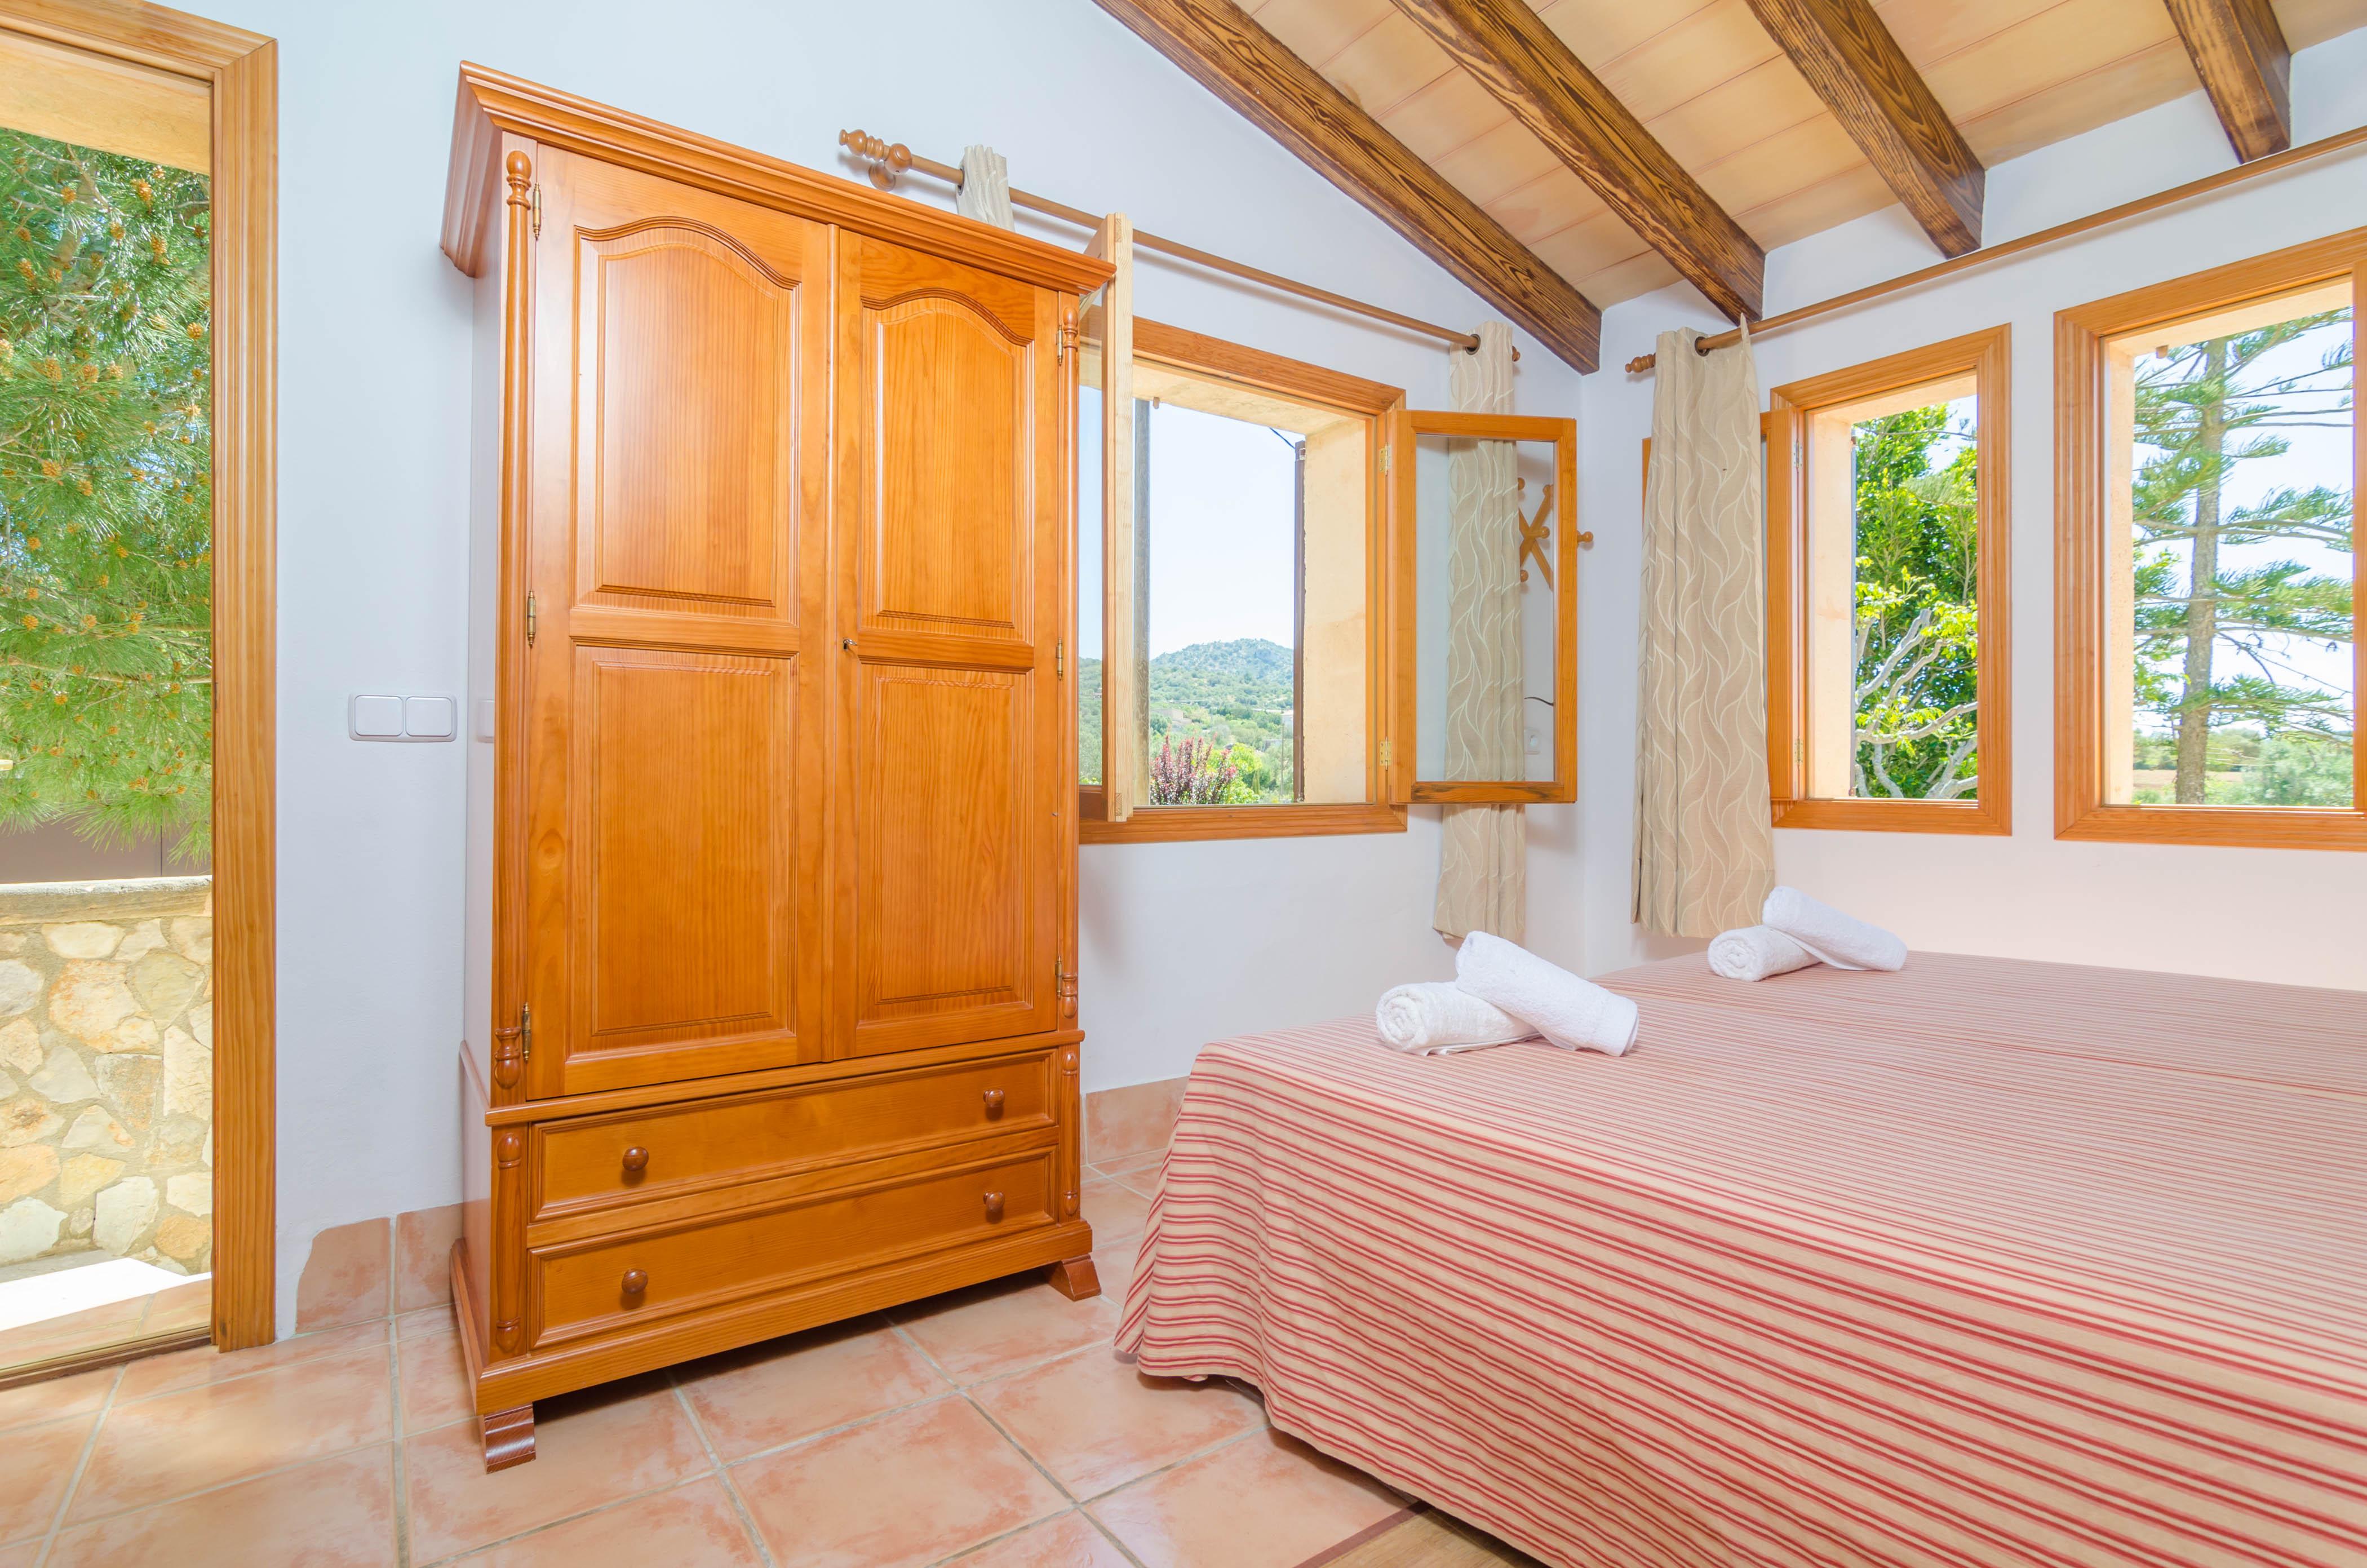 Ferienhaus SON MACIA (2186582), Son Macià, Mallorca, Balearische Inseln, Spanien, Bild 37